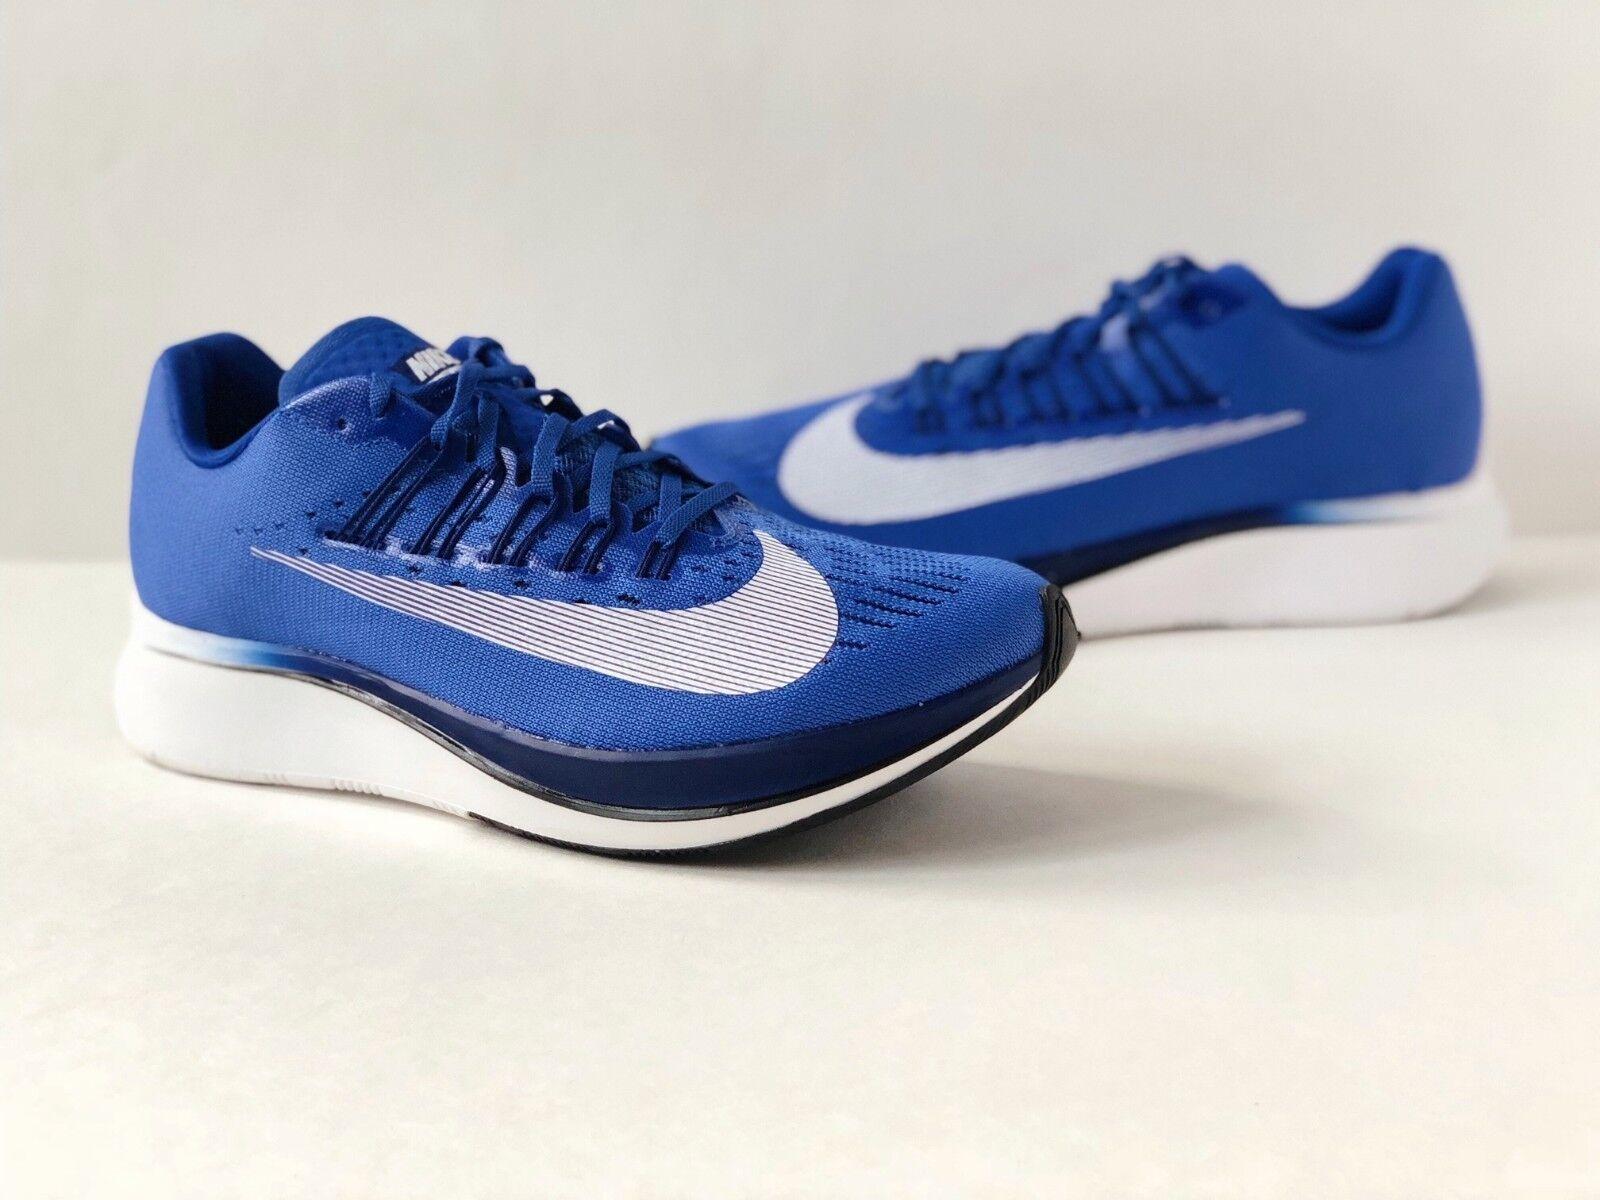 Nike zoom reale volare (sz 11,5] in bianco nero blu reale zoom libero sp 880848-411 2ccdad